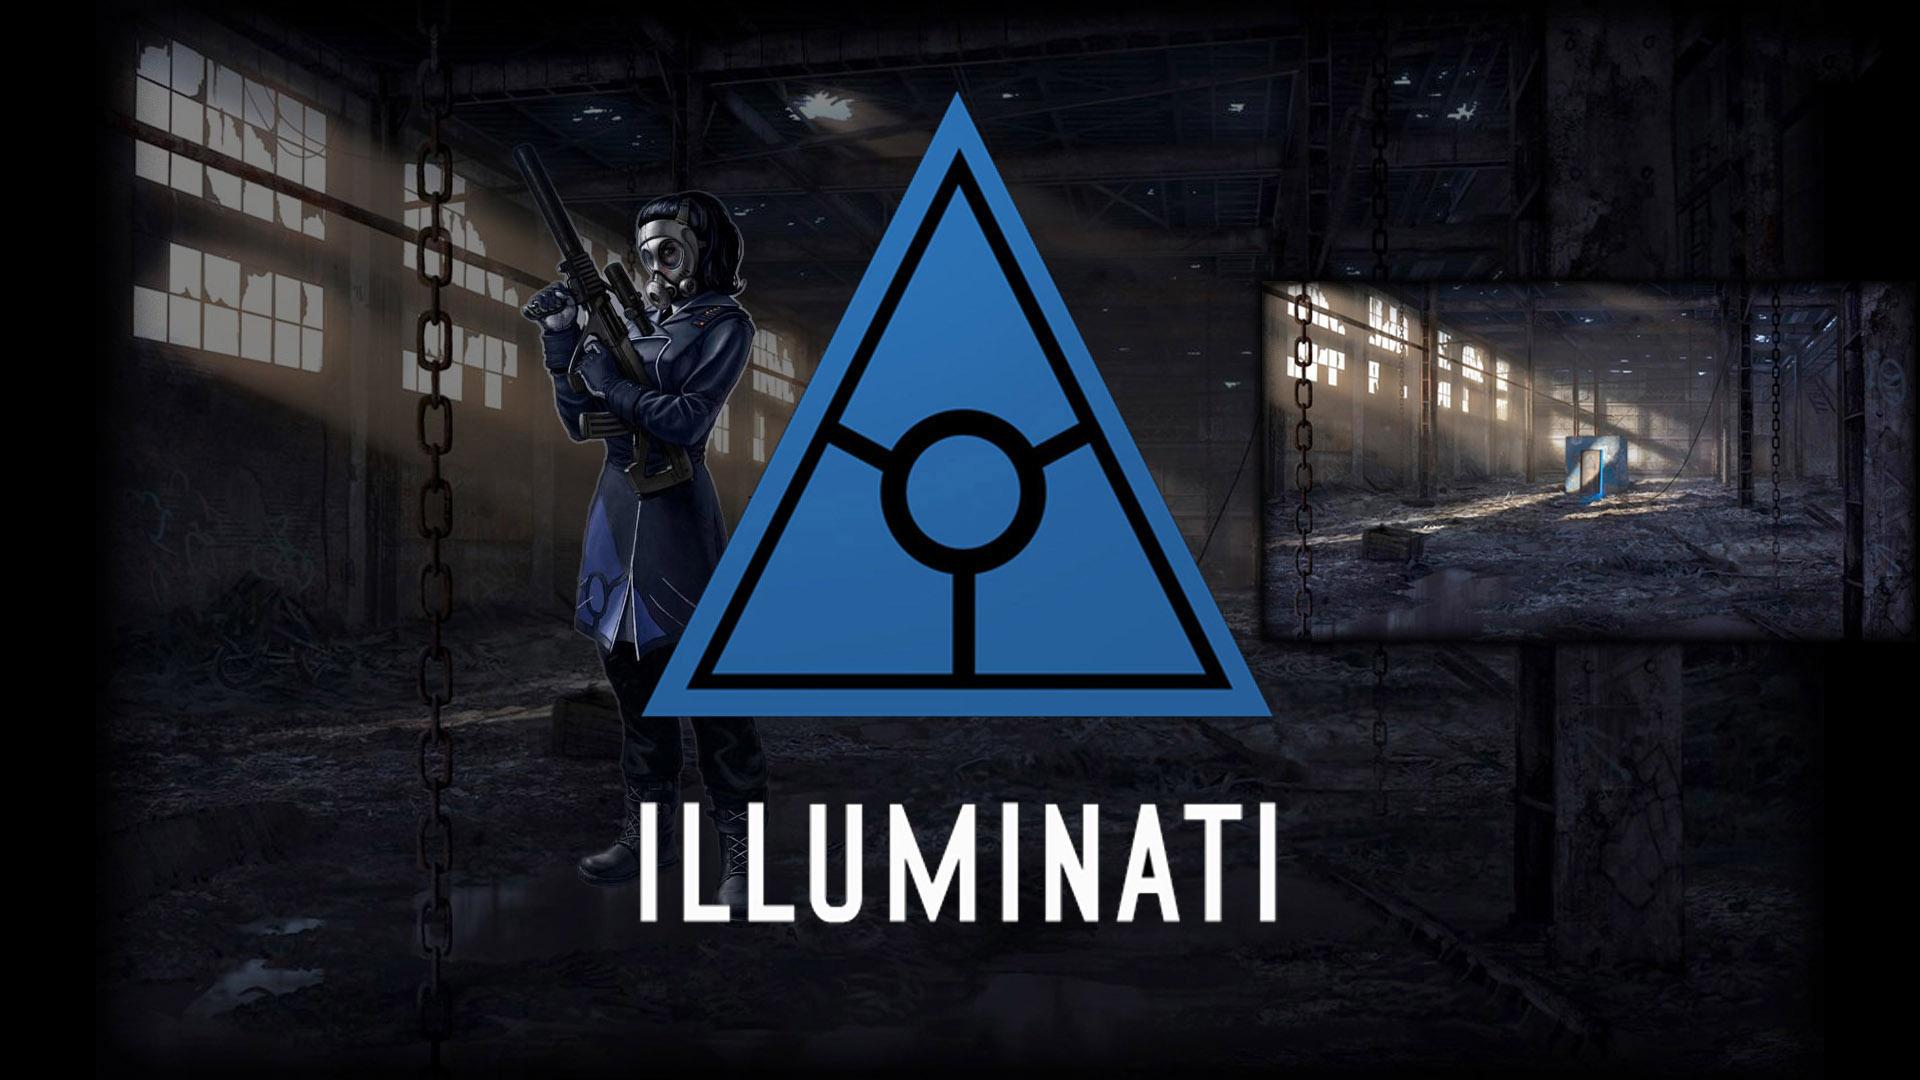 Gravity Falls Wallpaper For Computer Illuminati Backgrounds Pixelstalk Net